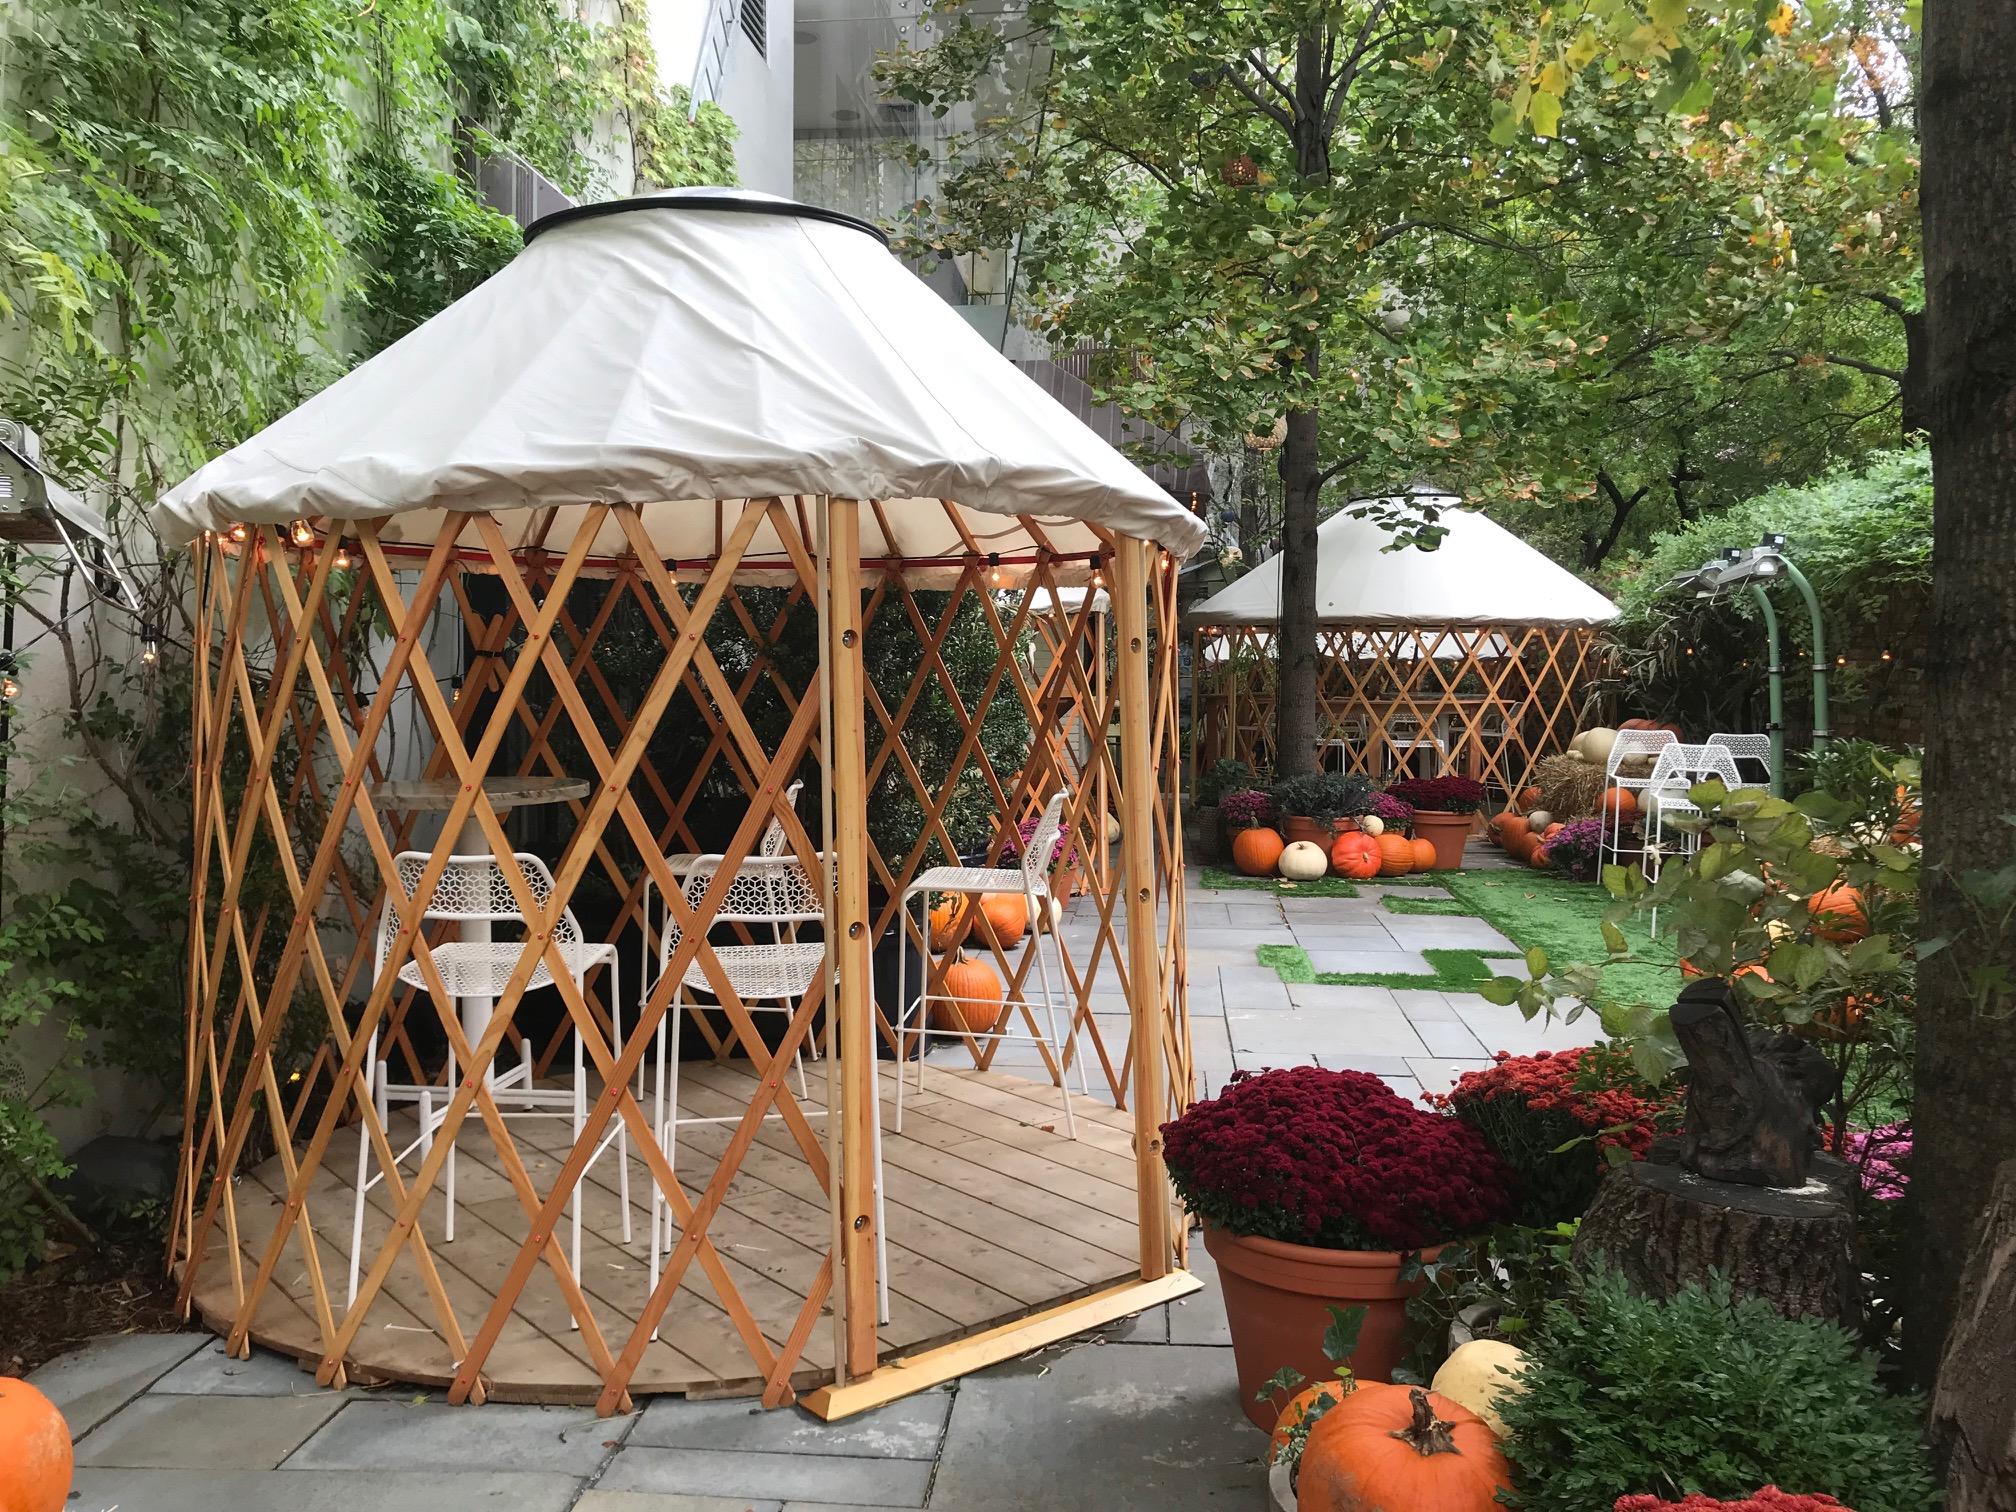 Restaurant Yurts Camping Yurts